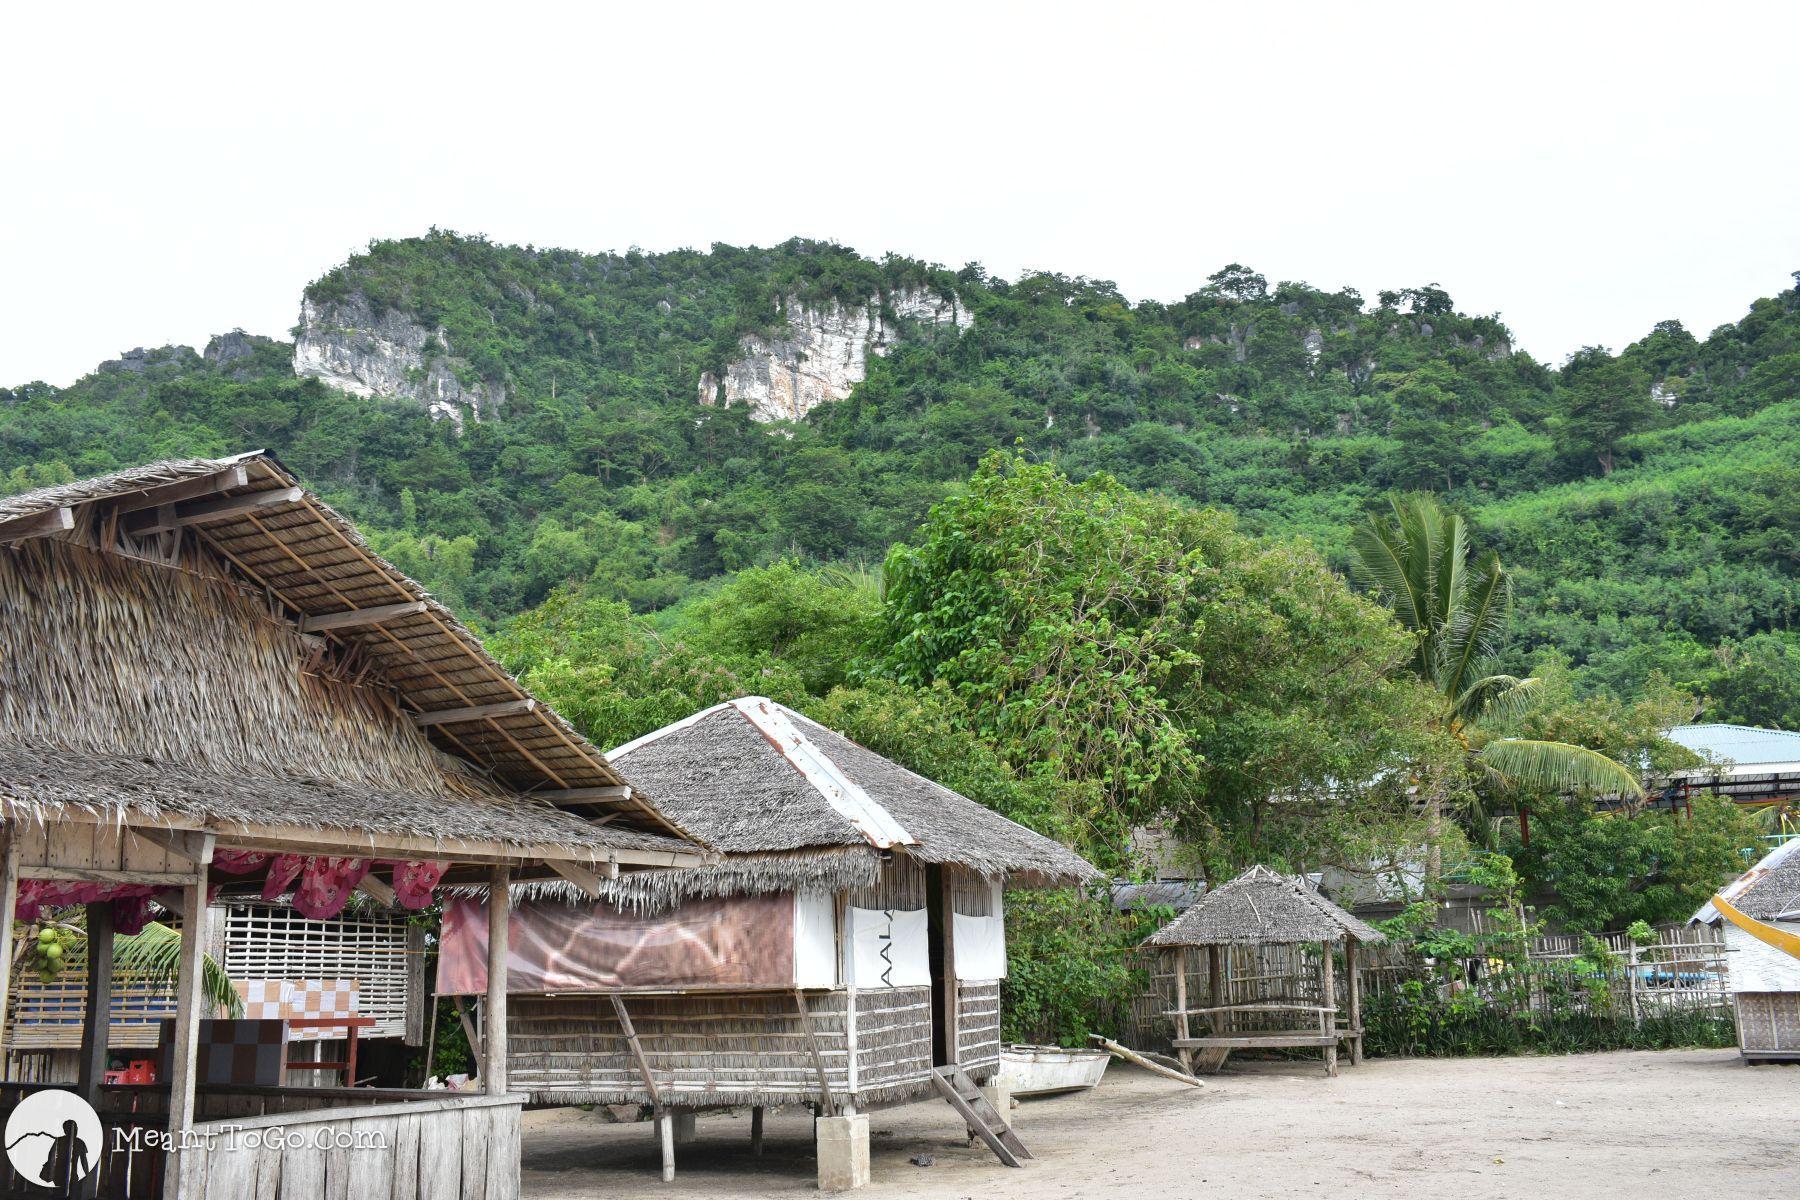 Islas de Gigantes accommodations